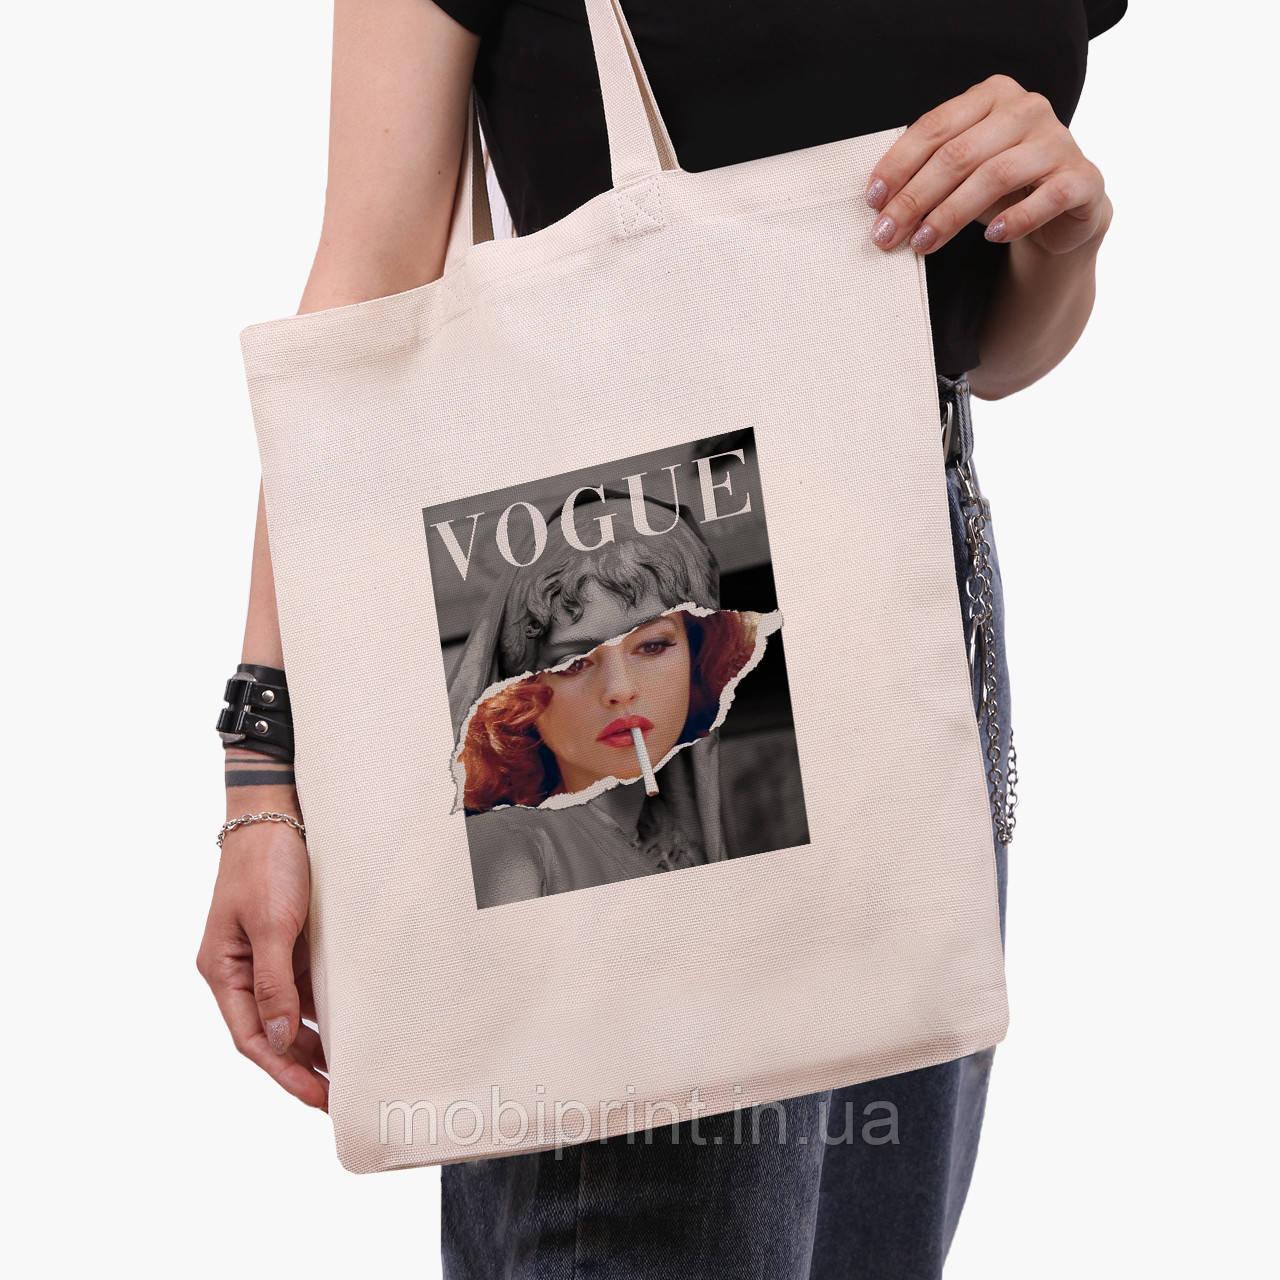 Еко сумка шоппер Ренесанс-Моніка Беллуччі (Monica Bellucci) (9227-1588) екосумка шопер 41*35 см